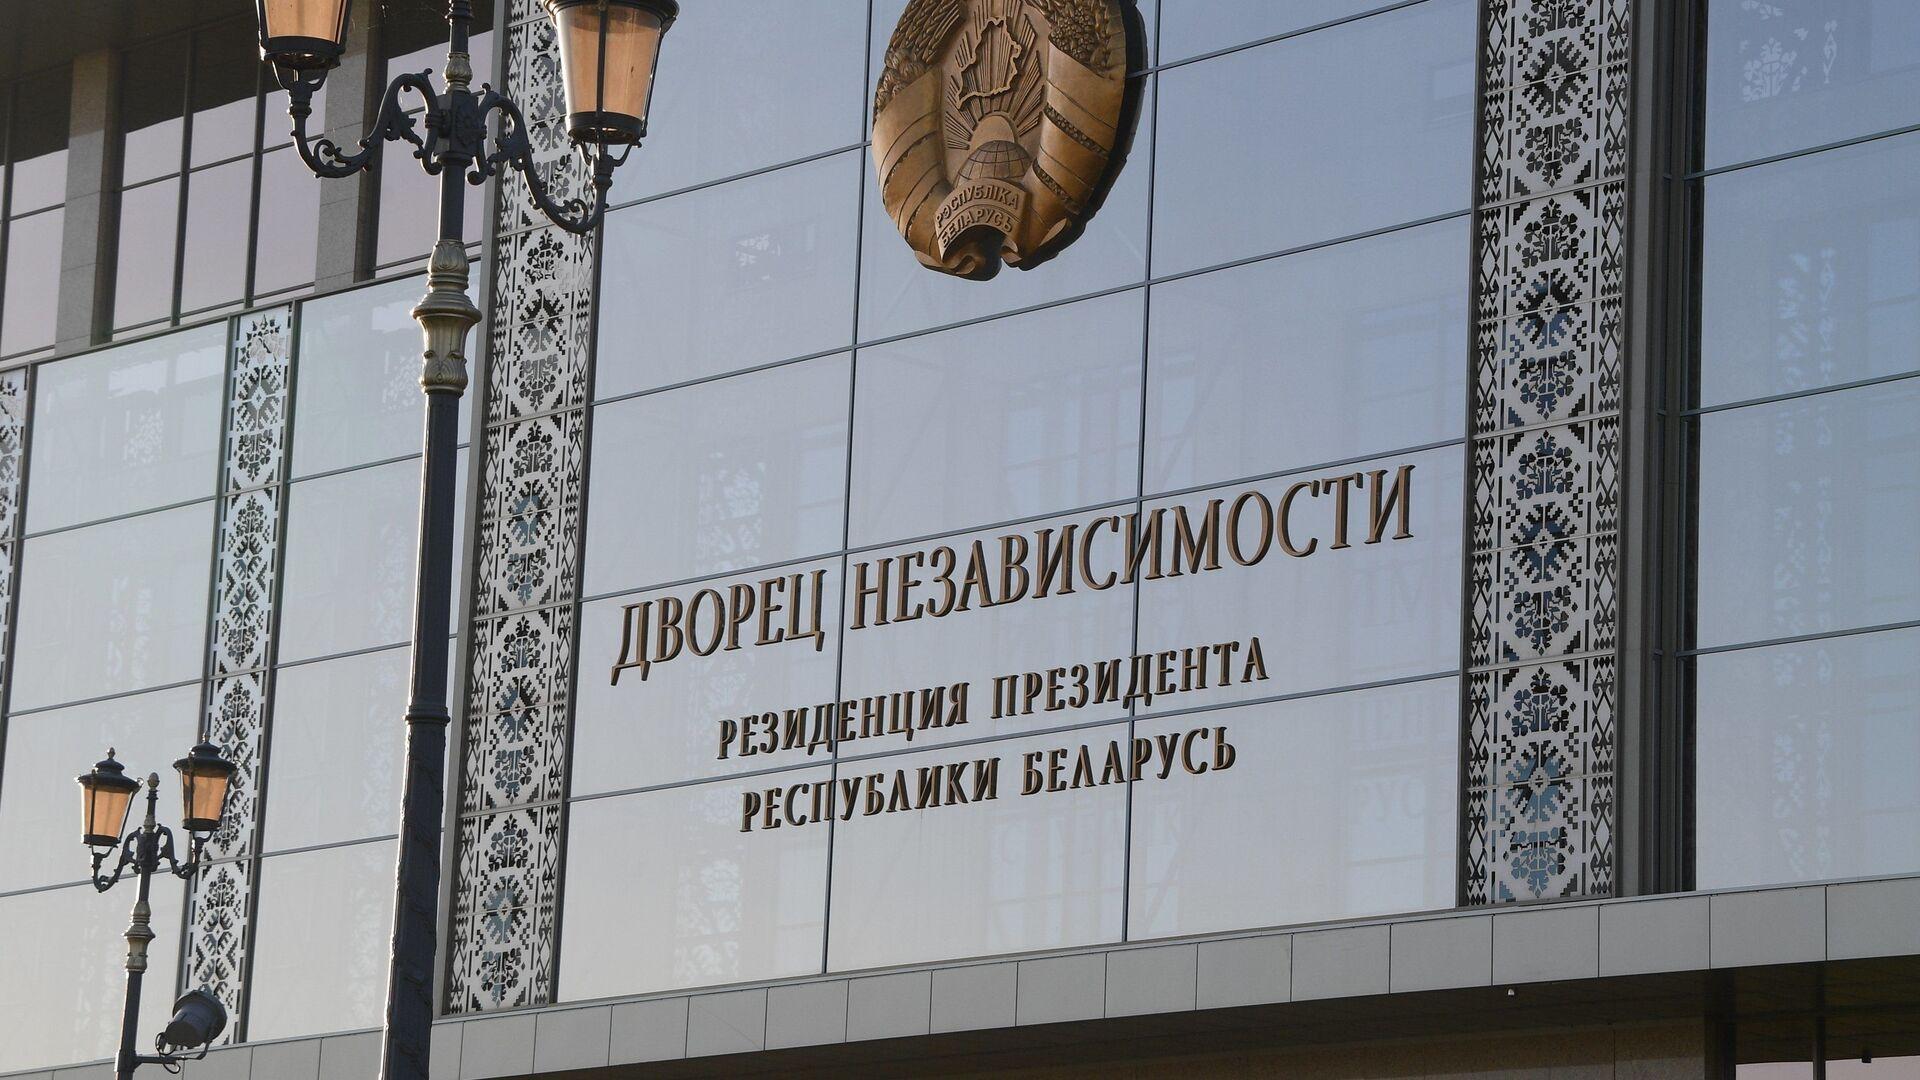 Дворец Независимости в Минске - Sputnik Беларусь, 1920, 20.09.2021